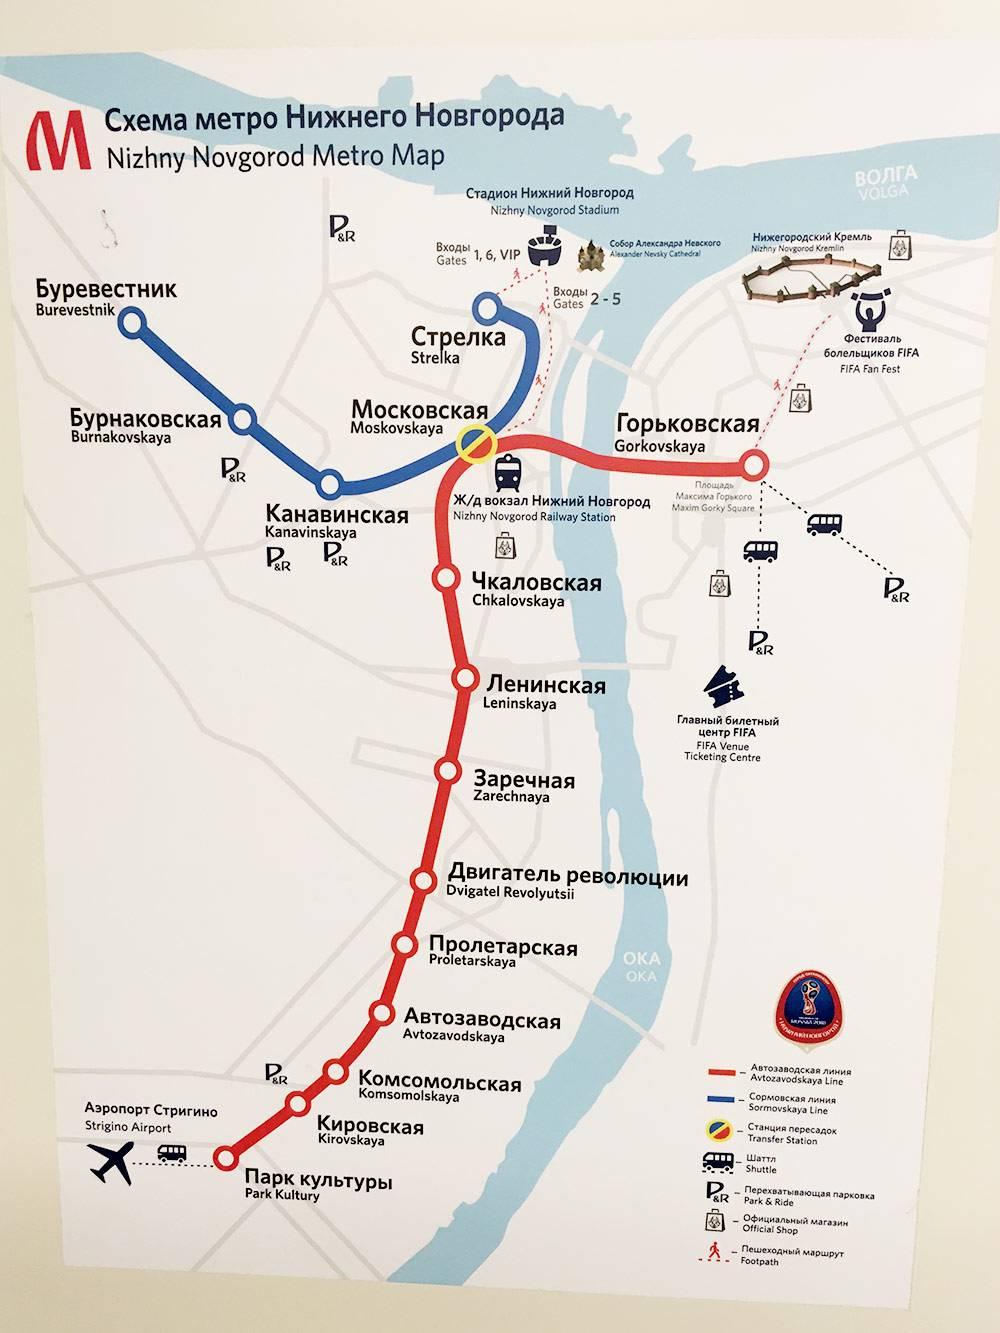 Проезд в метро тоже стоит 28<span class=ruble>Р</span>, если платить пэйпассом — 26<span class=ruble>Р</span>